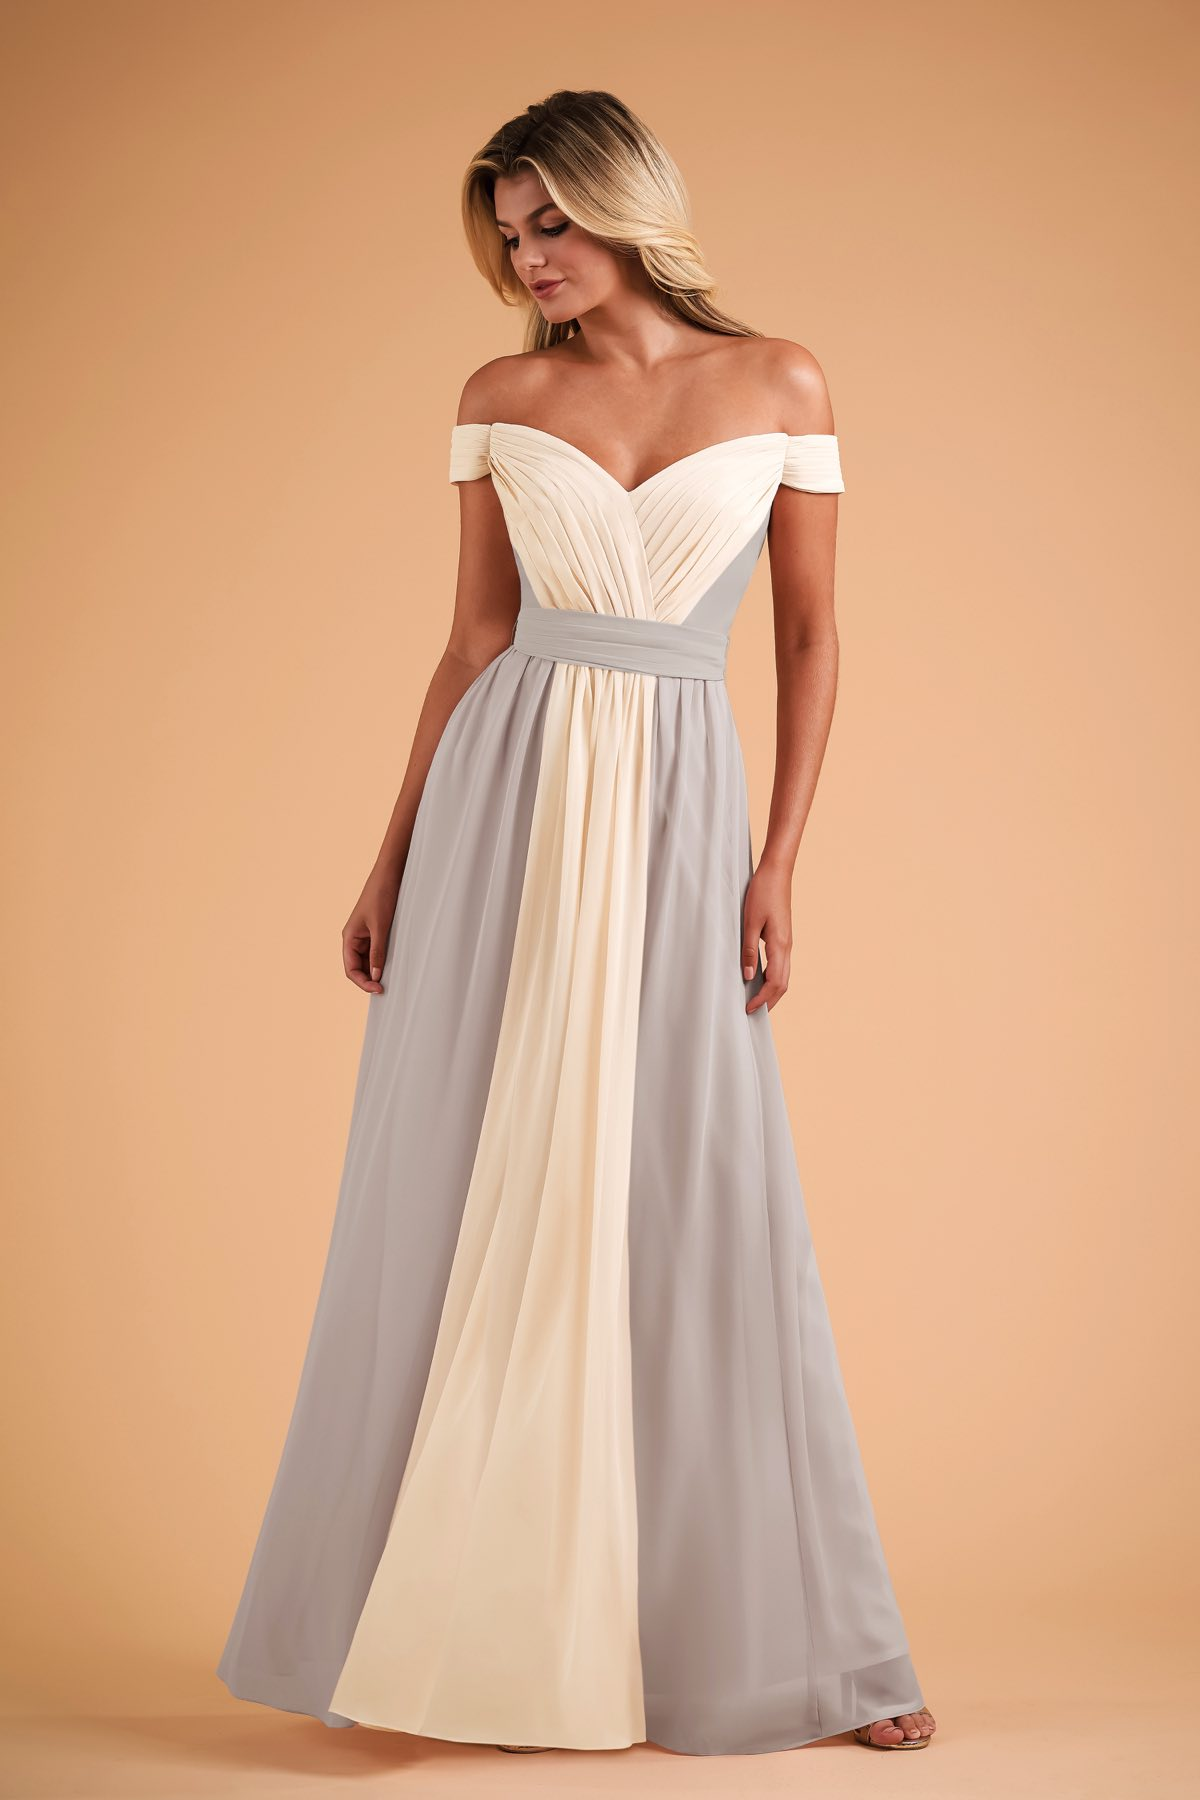 B223004 Two Tone Portrait Neckline Bridesmaid Dress With